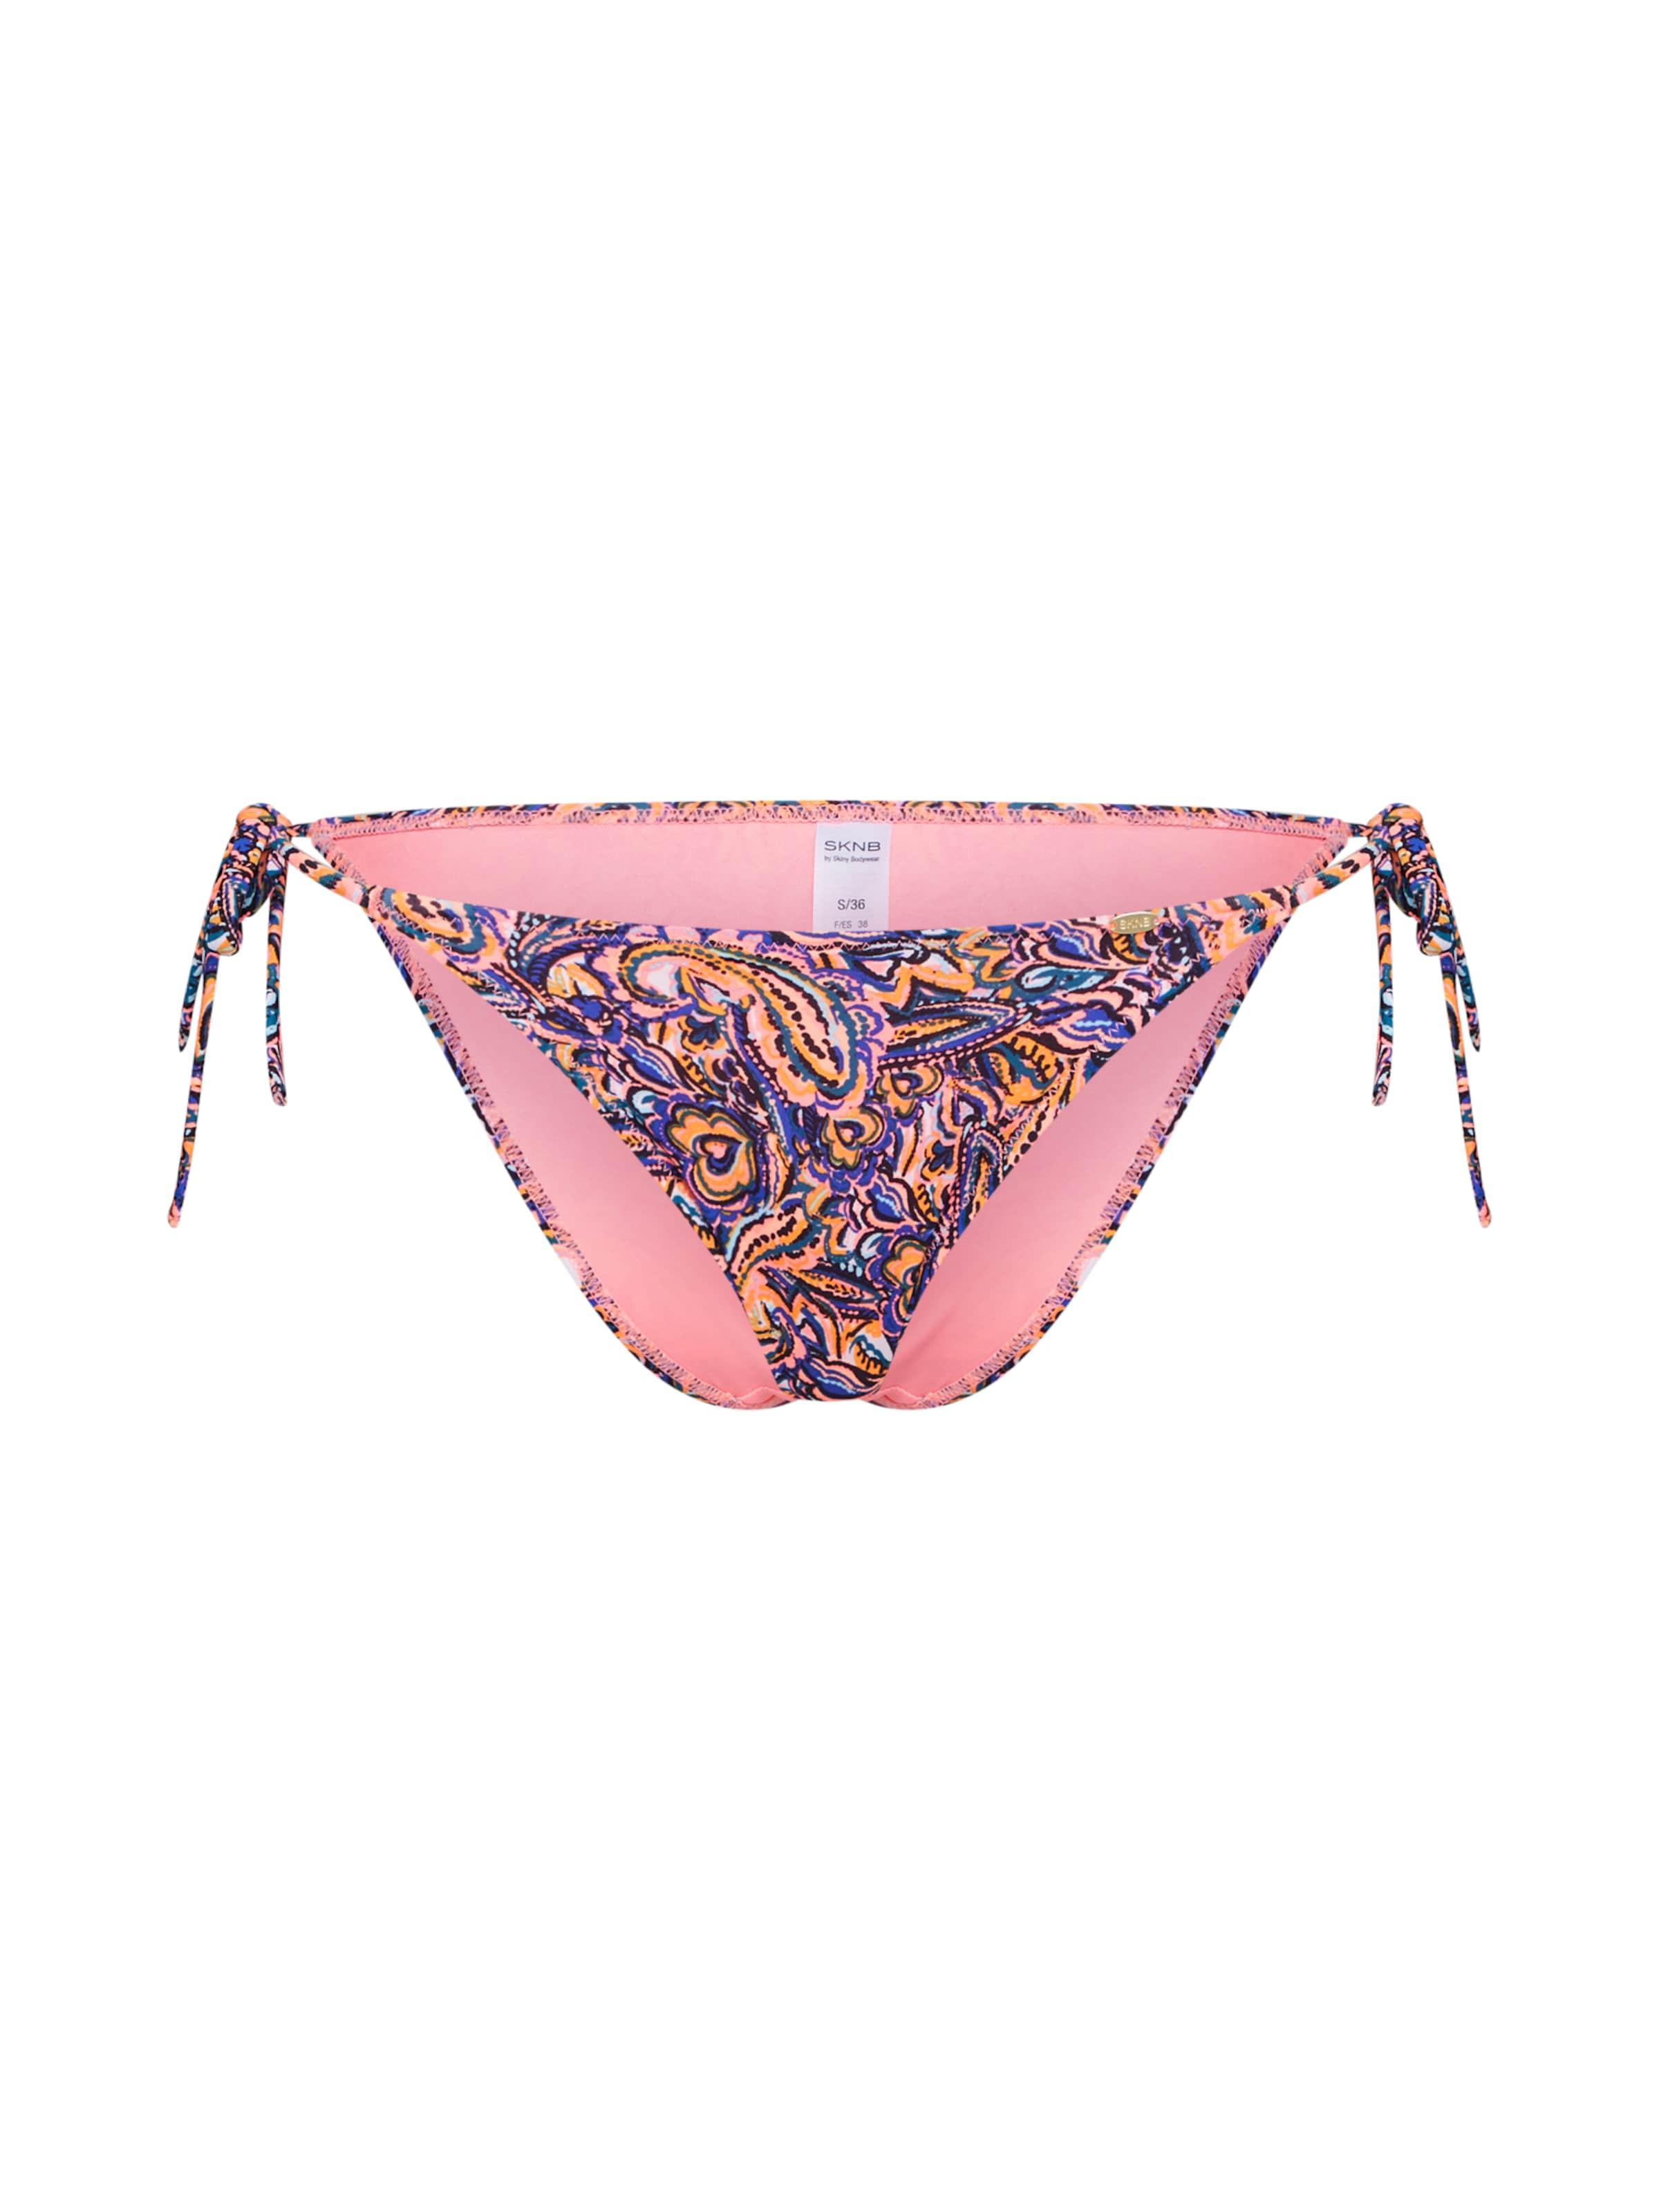 Bikinihose Cheeky' In 'gypsy Skiny Mischfarben uJc3l1TK5F